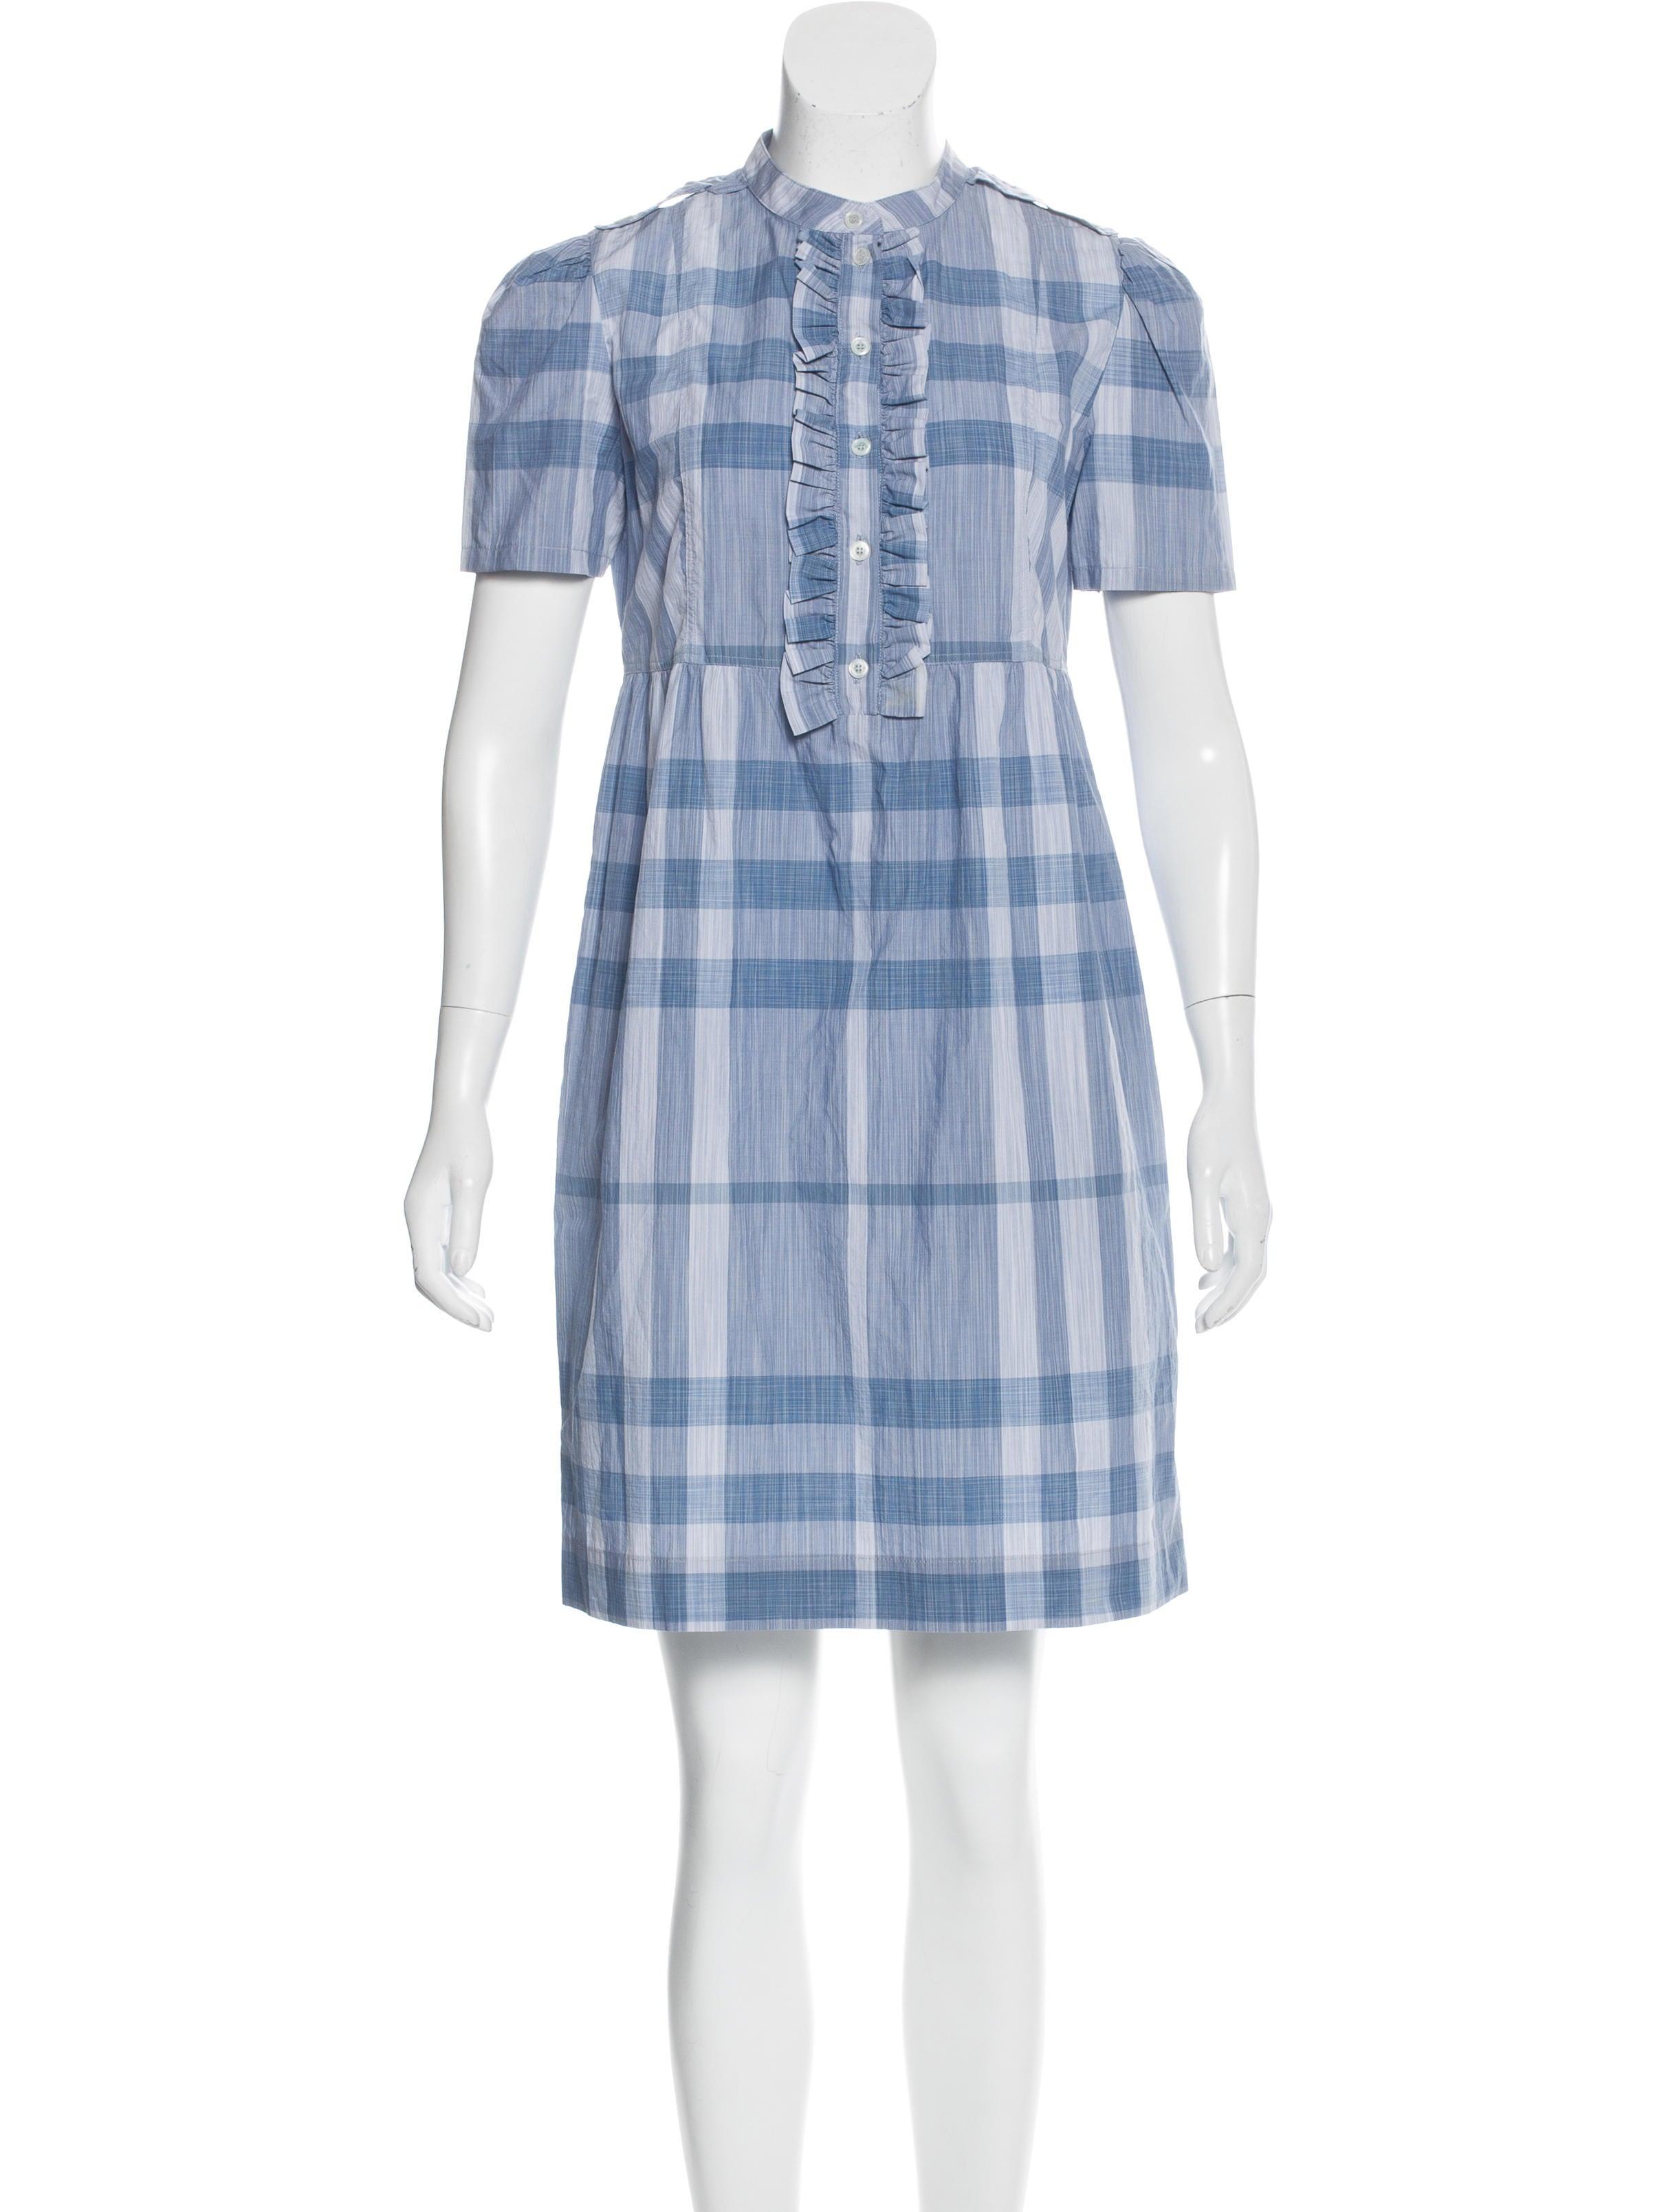 Burberry Brit Plaid Short Sleeve Dress Clothing